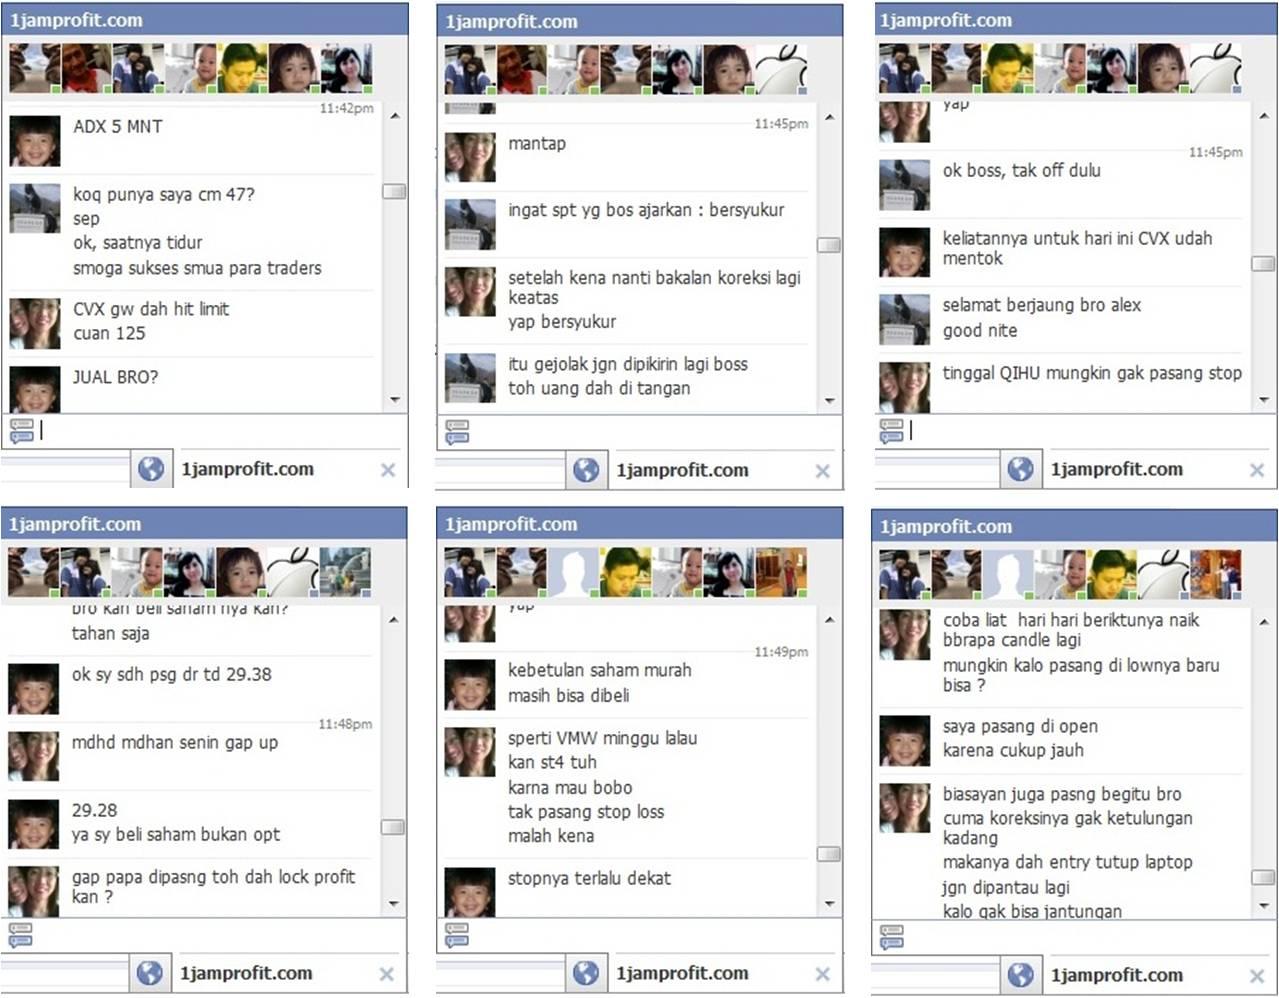 Kumpulan Status FB Terbaru 2017 Kata Kata Gokil Raja Gombal